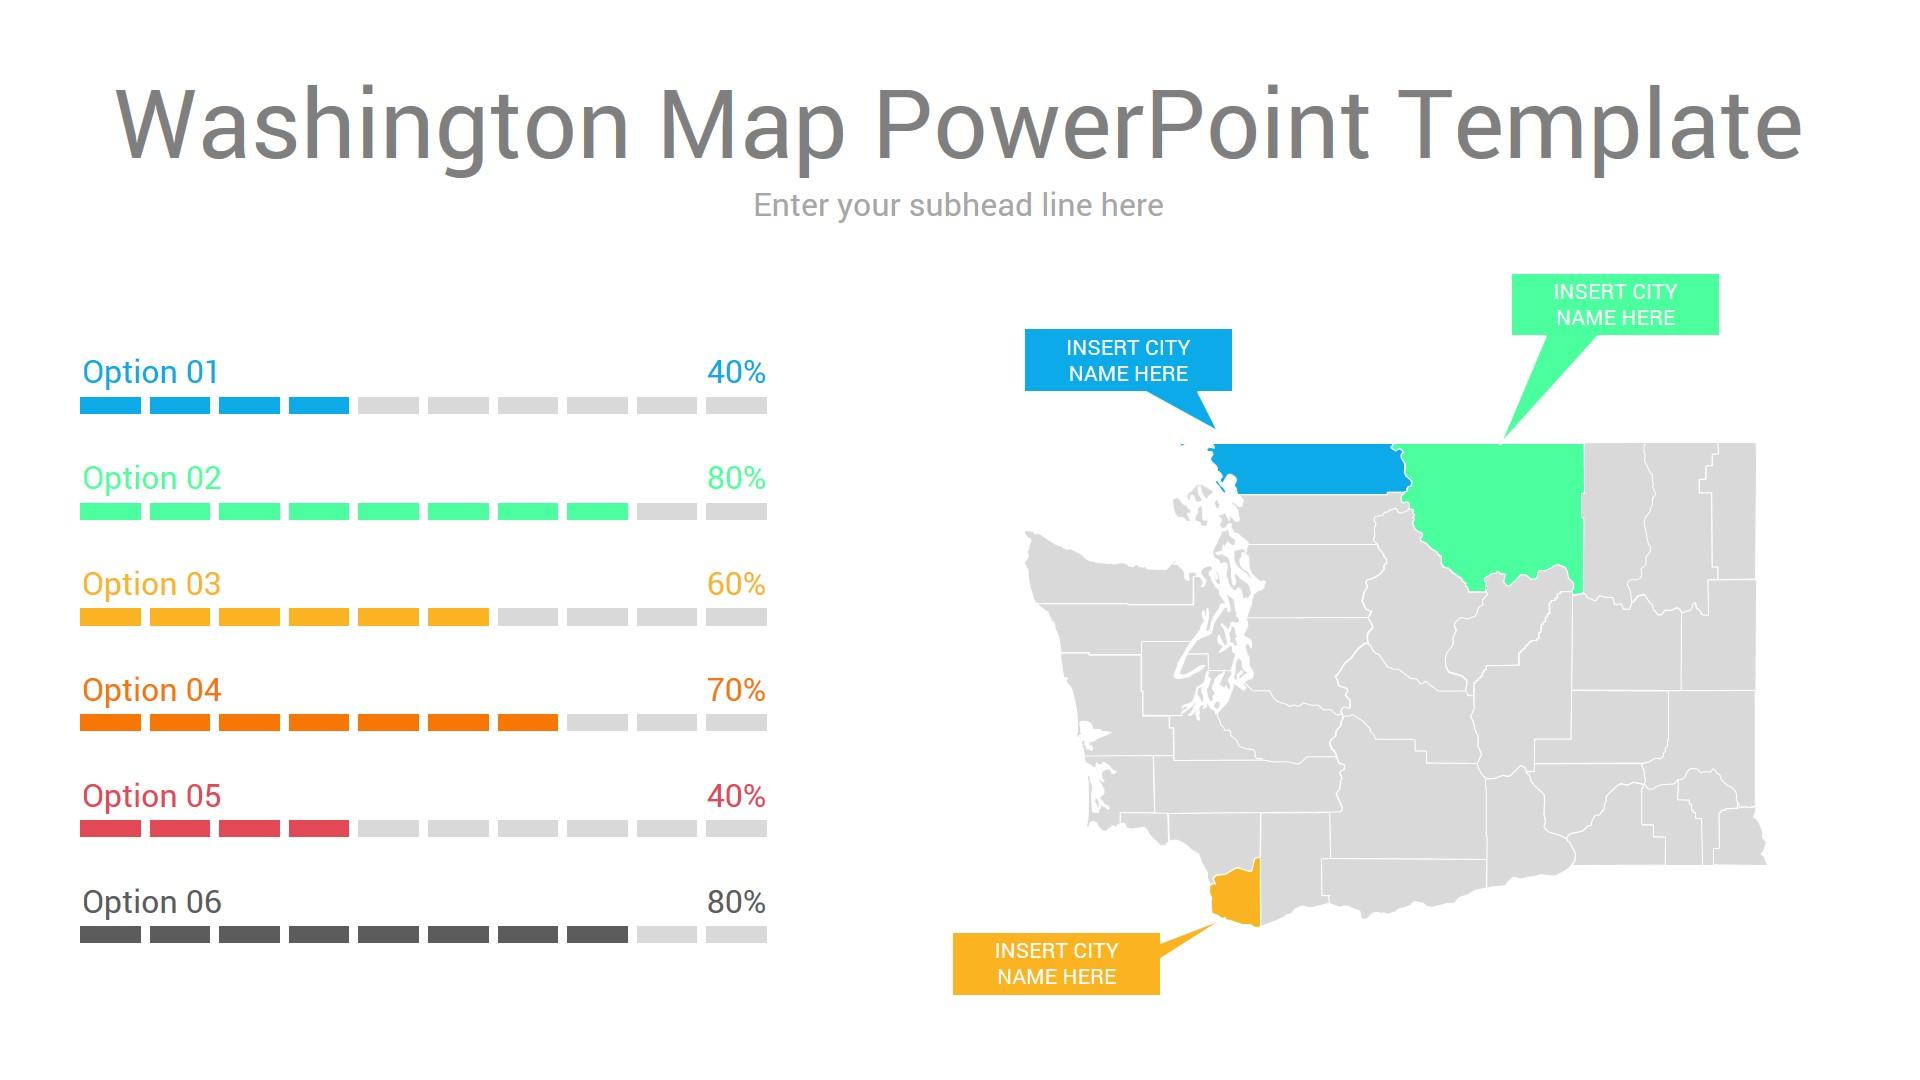 Washington map powerpoint template